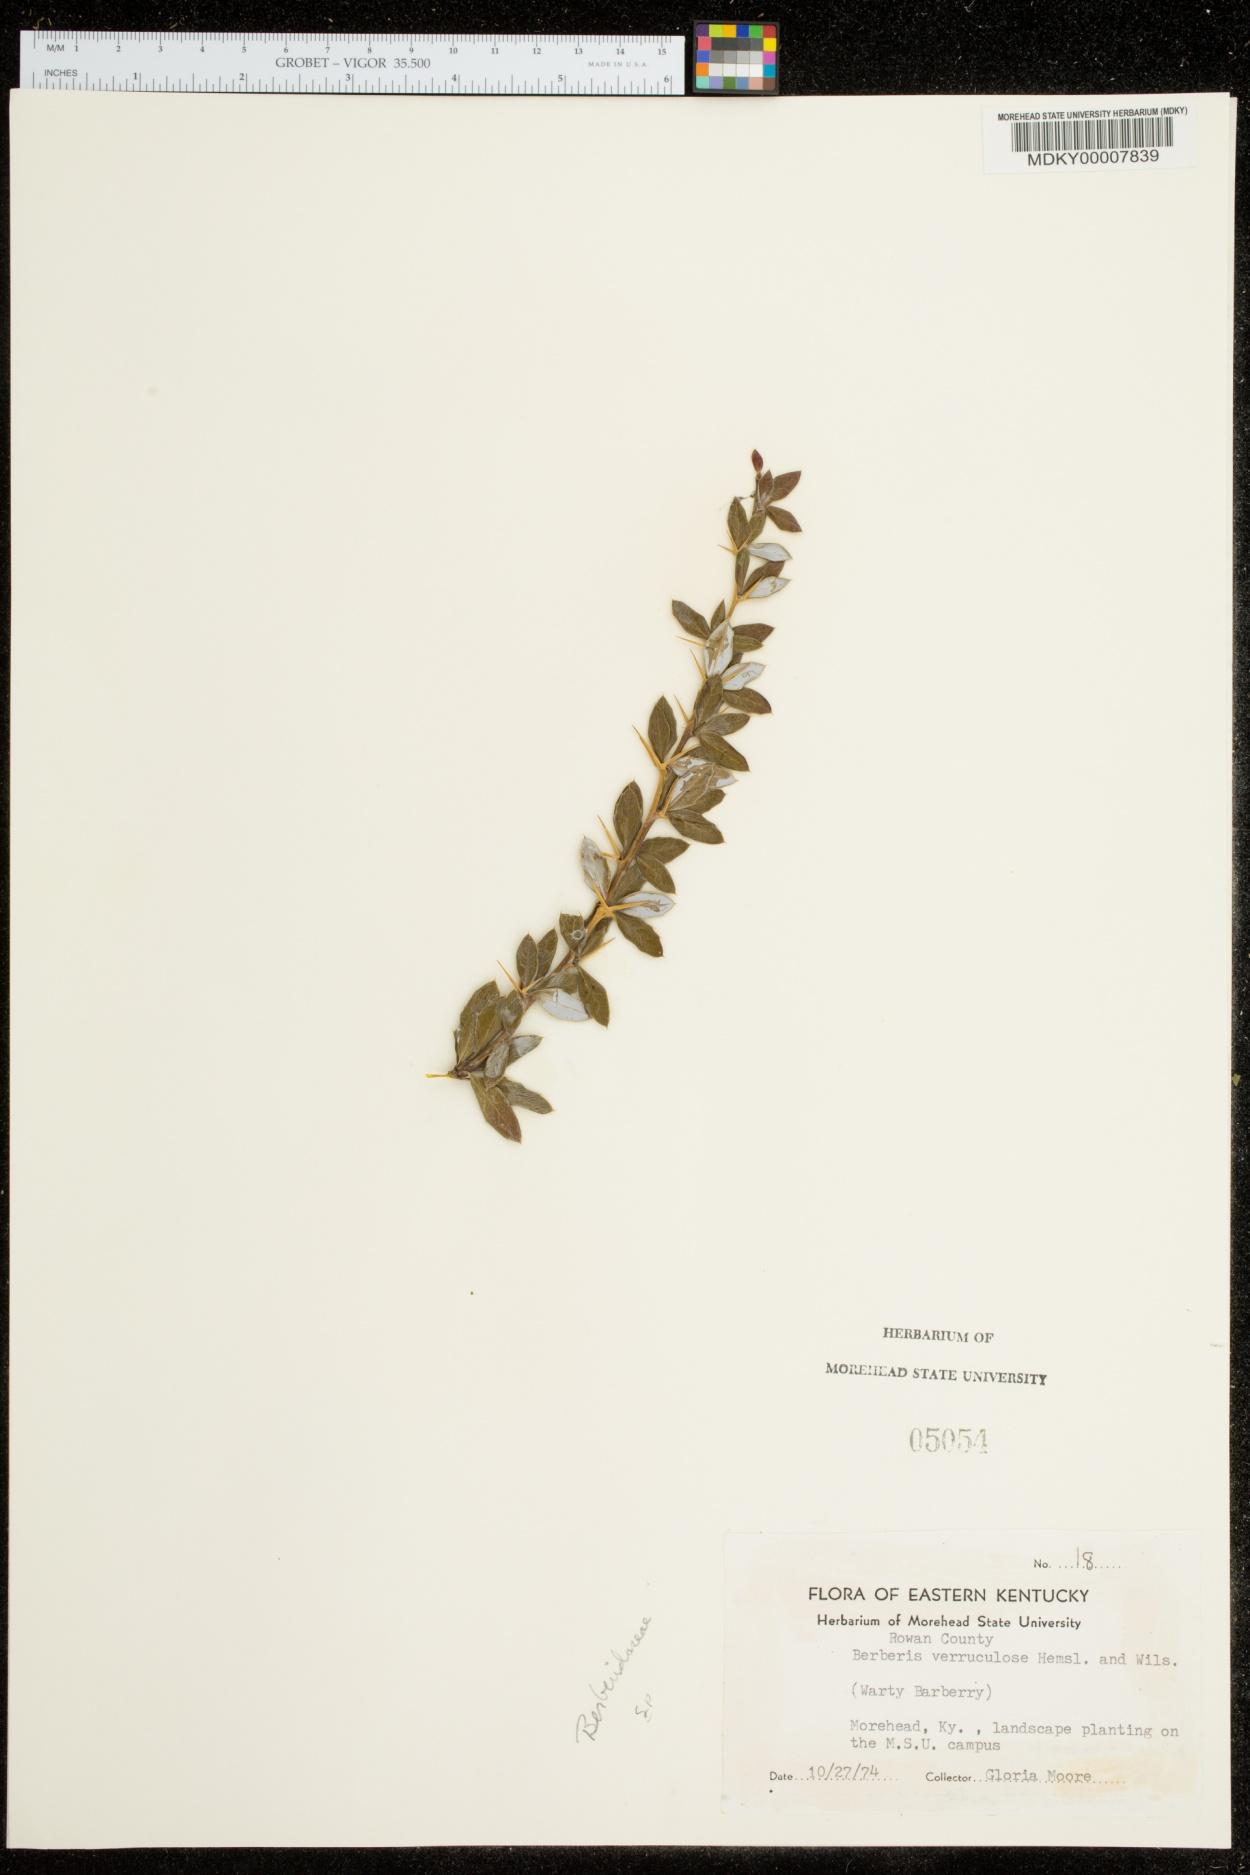 Berberis verruculosa image